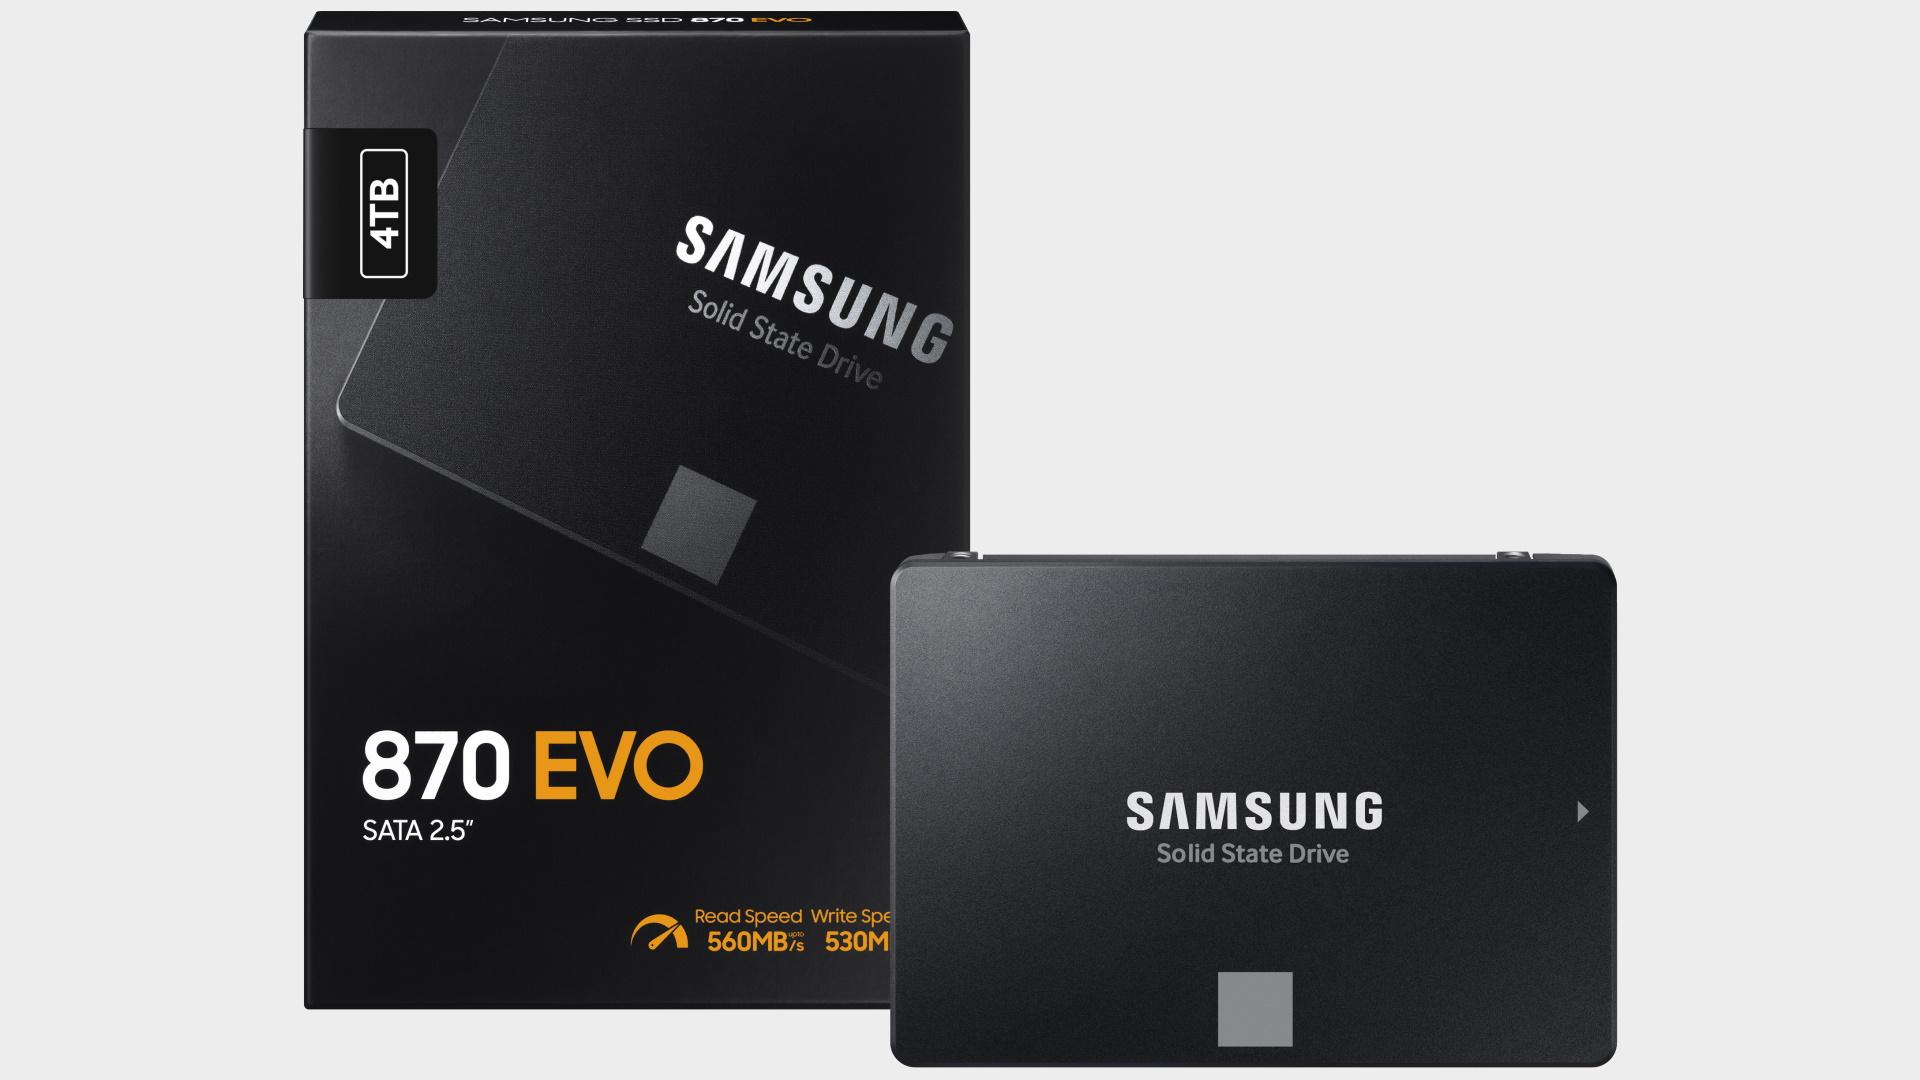 Samsung EVO 870 SSD